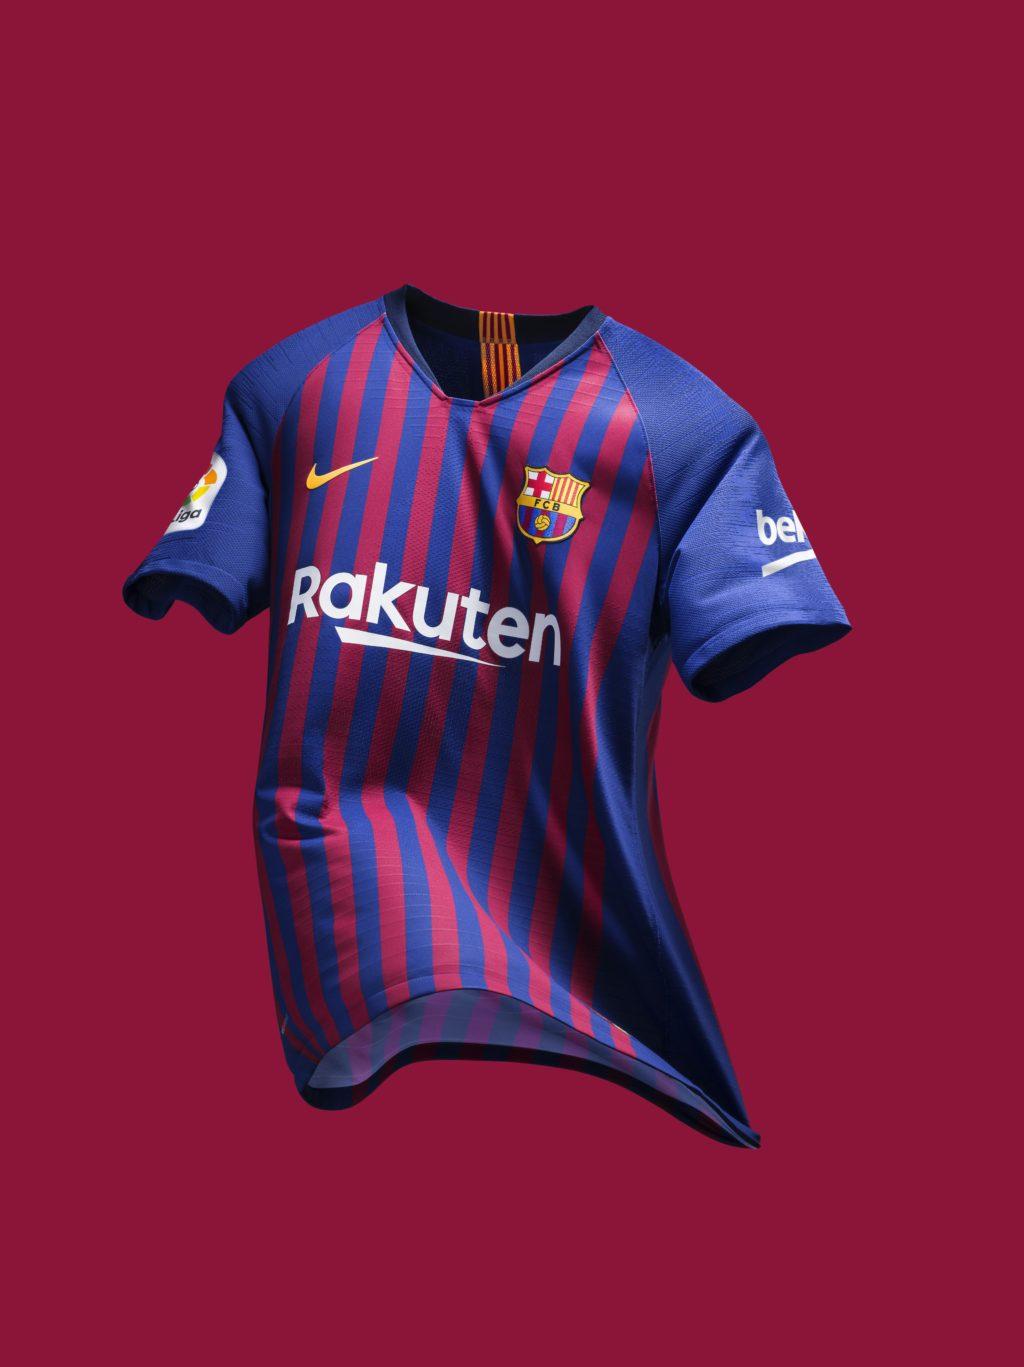 Maillot Domicile FC Barcelona acheter